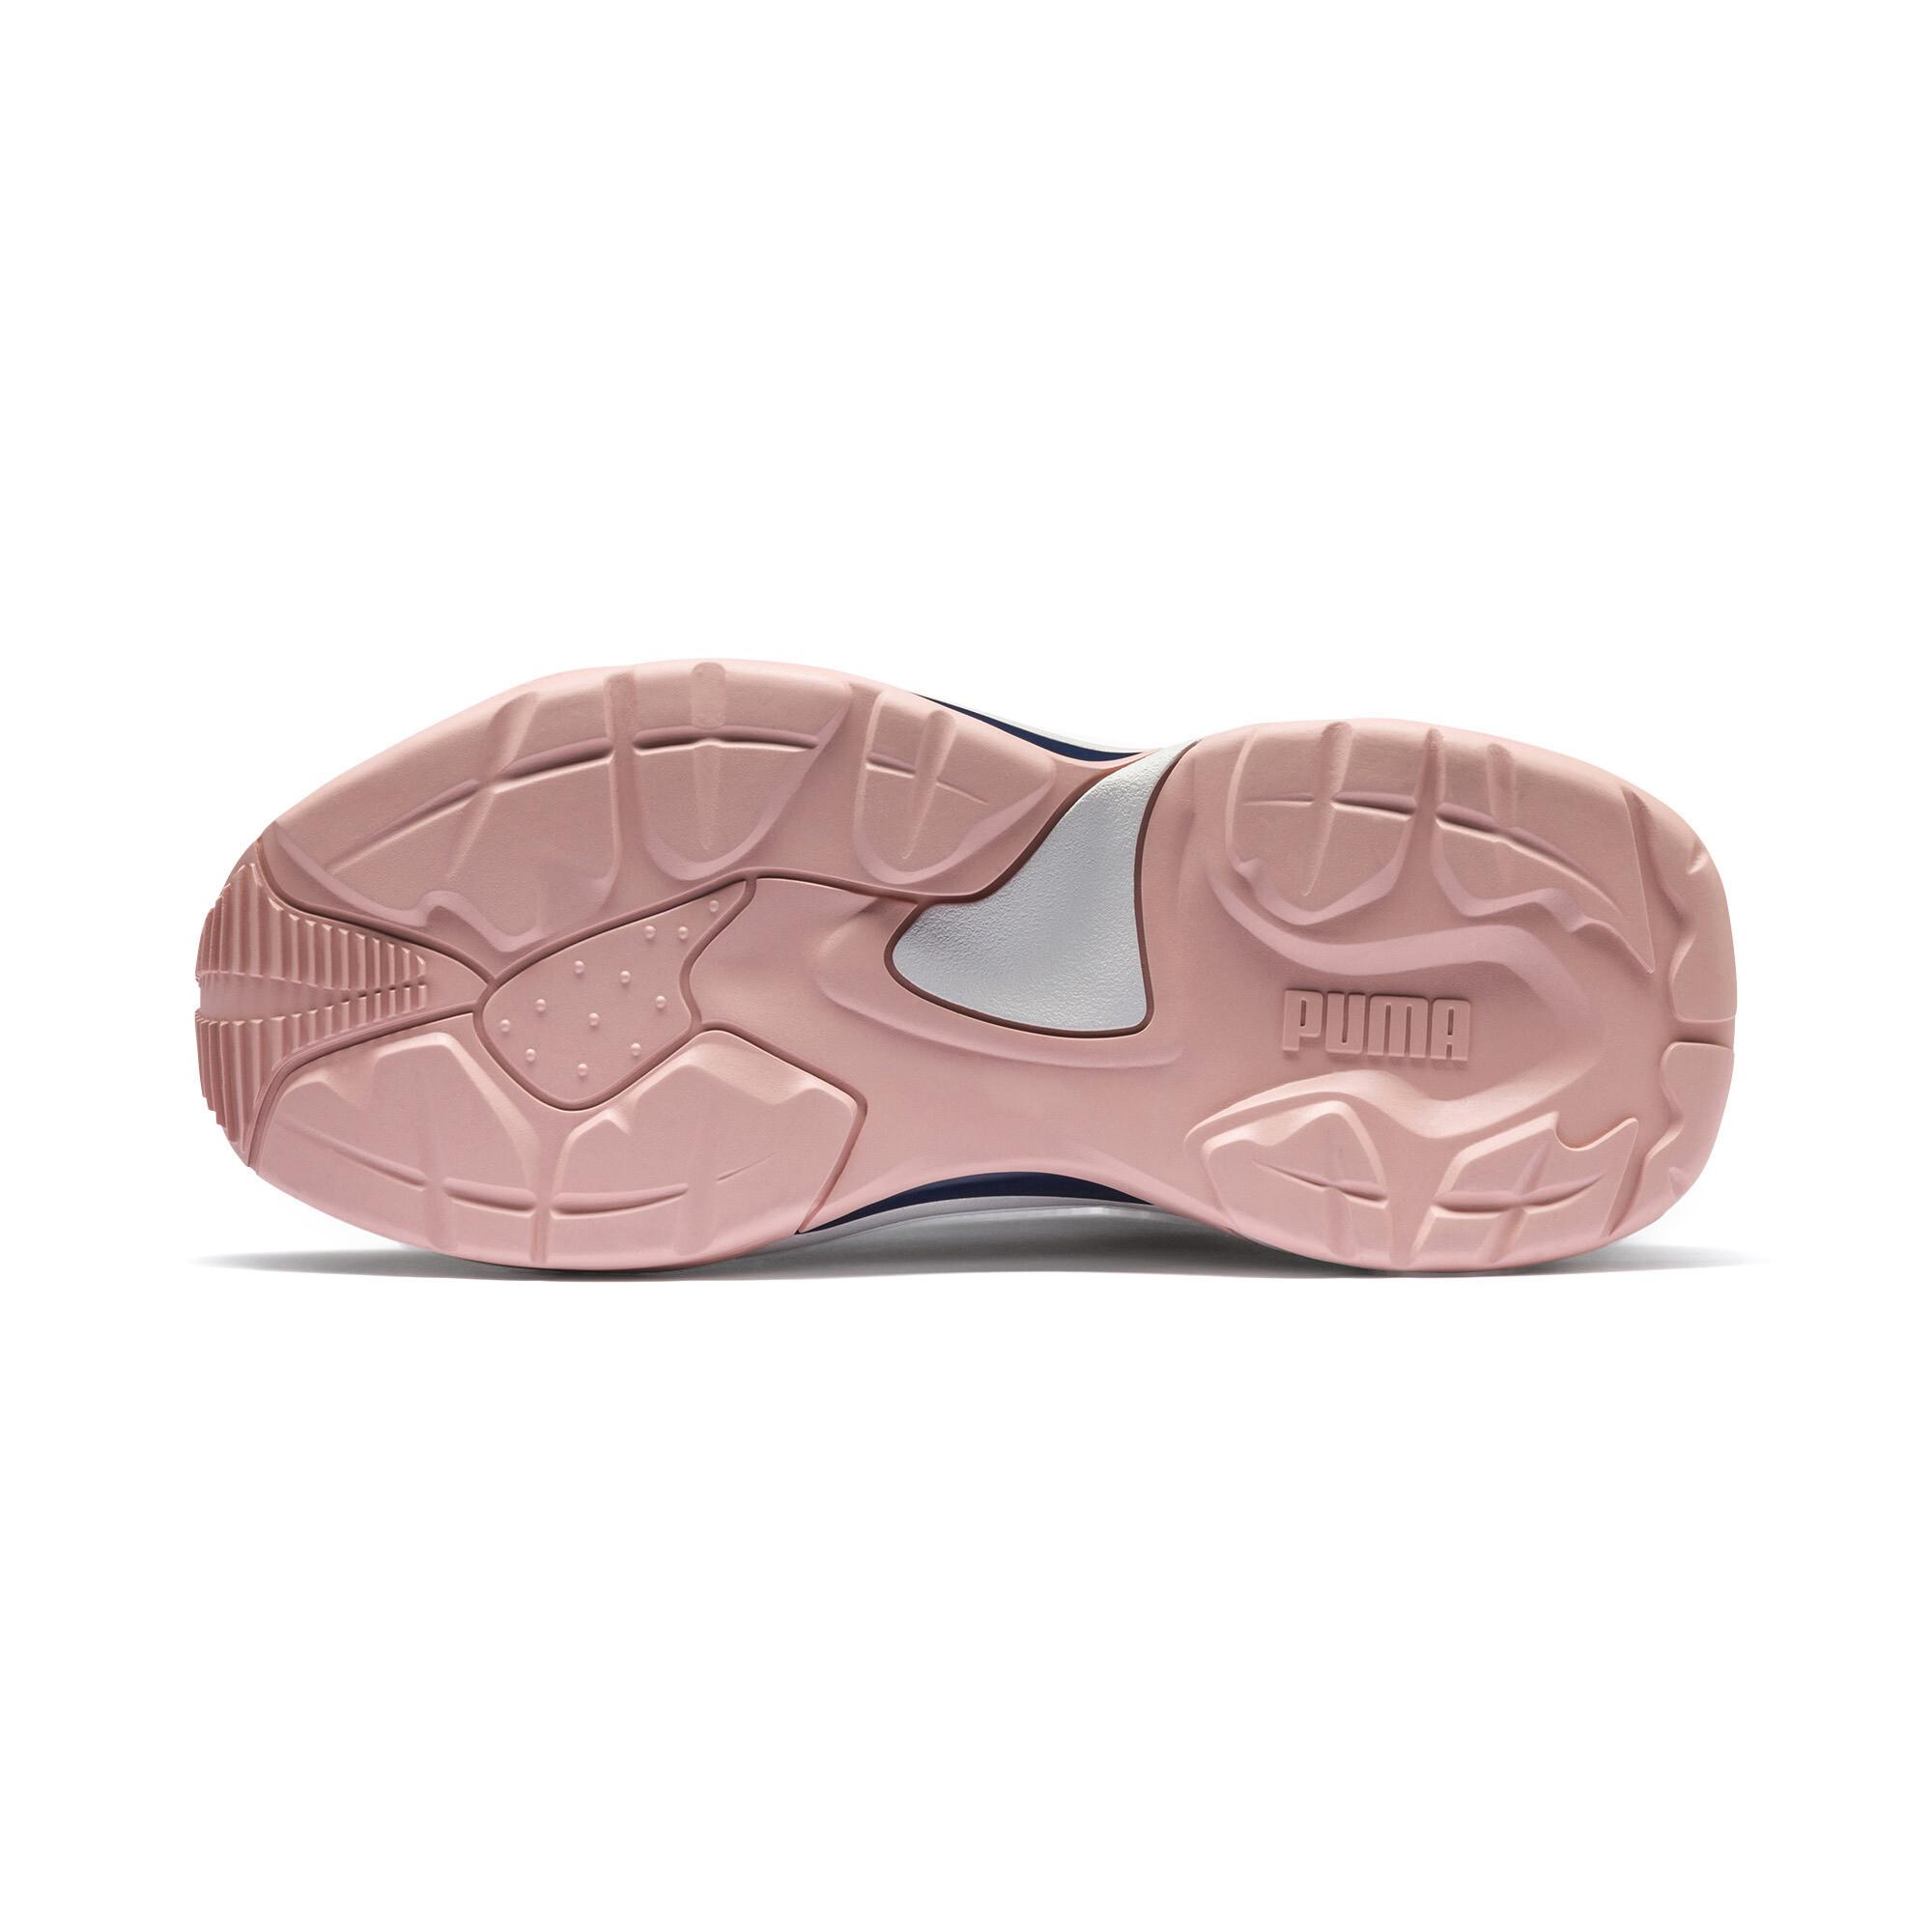 Image Puma Thunder Rive Gauche Women's Sneakers #5